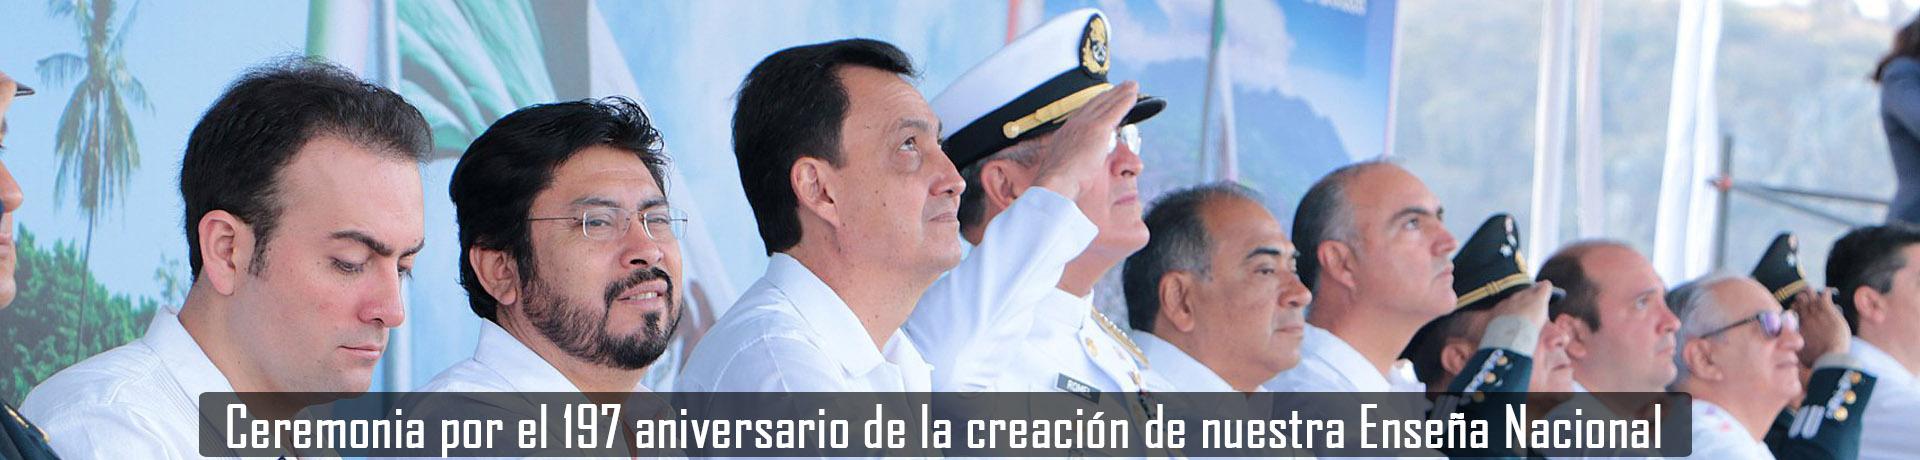 slide_bandera